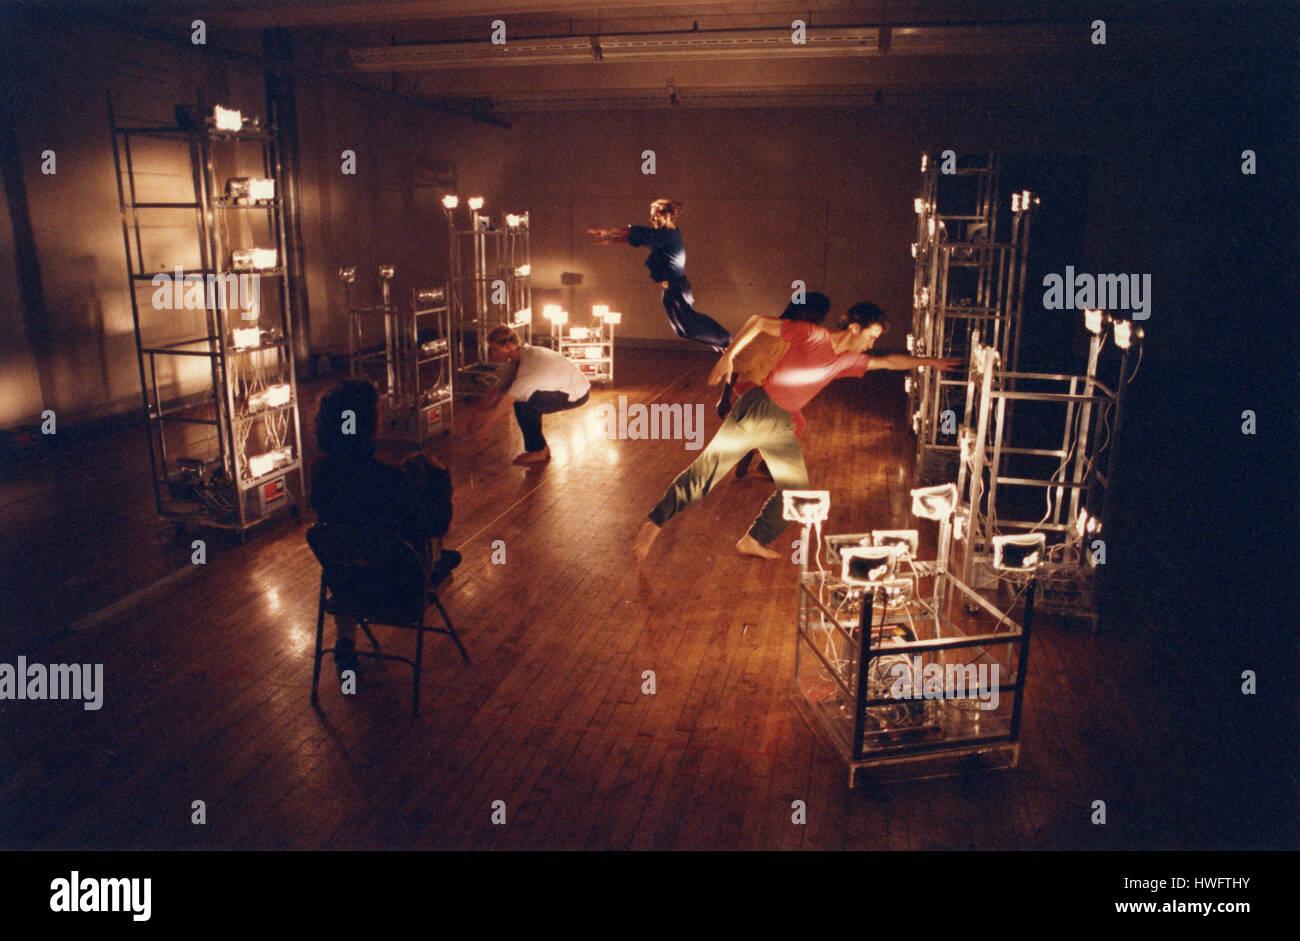 FILE: New York, USA. 18th Feb, 2017. American dancer and choreographer Trisha Brown in Soho, New York, 1992 rehearsing - Stock Image